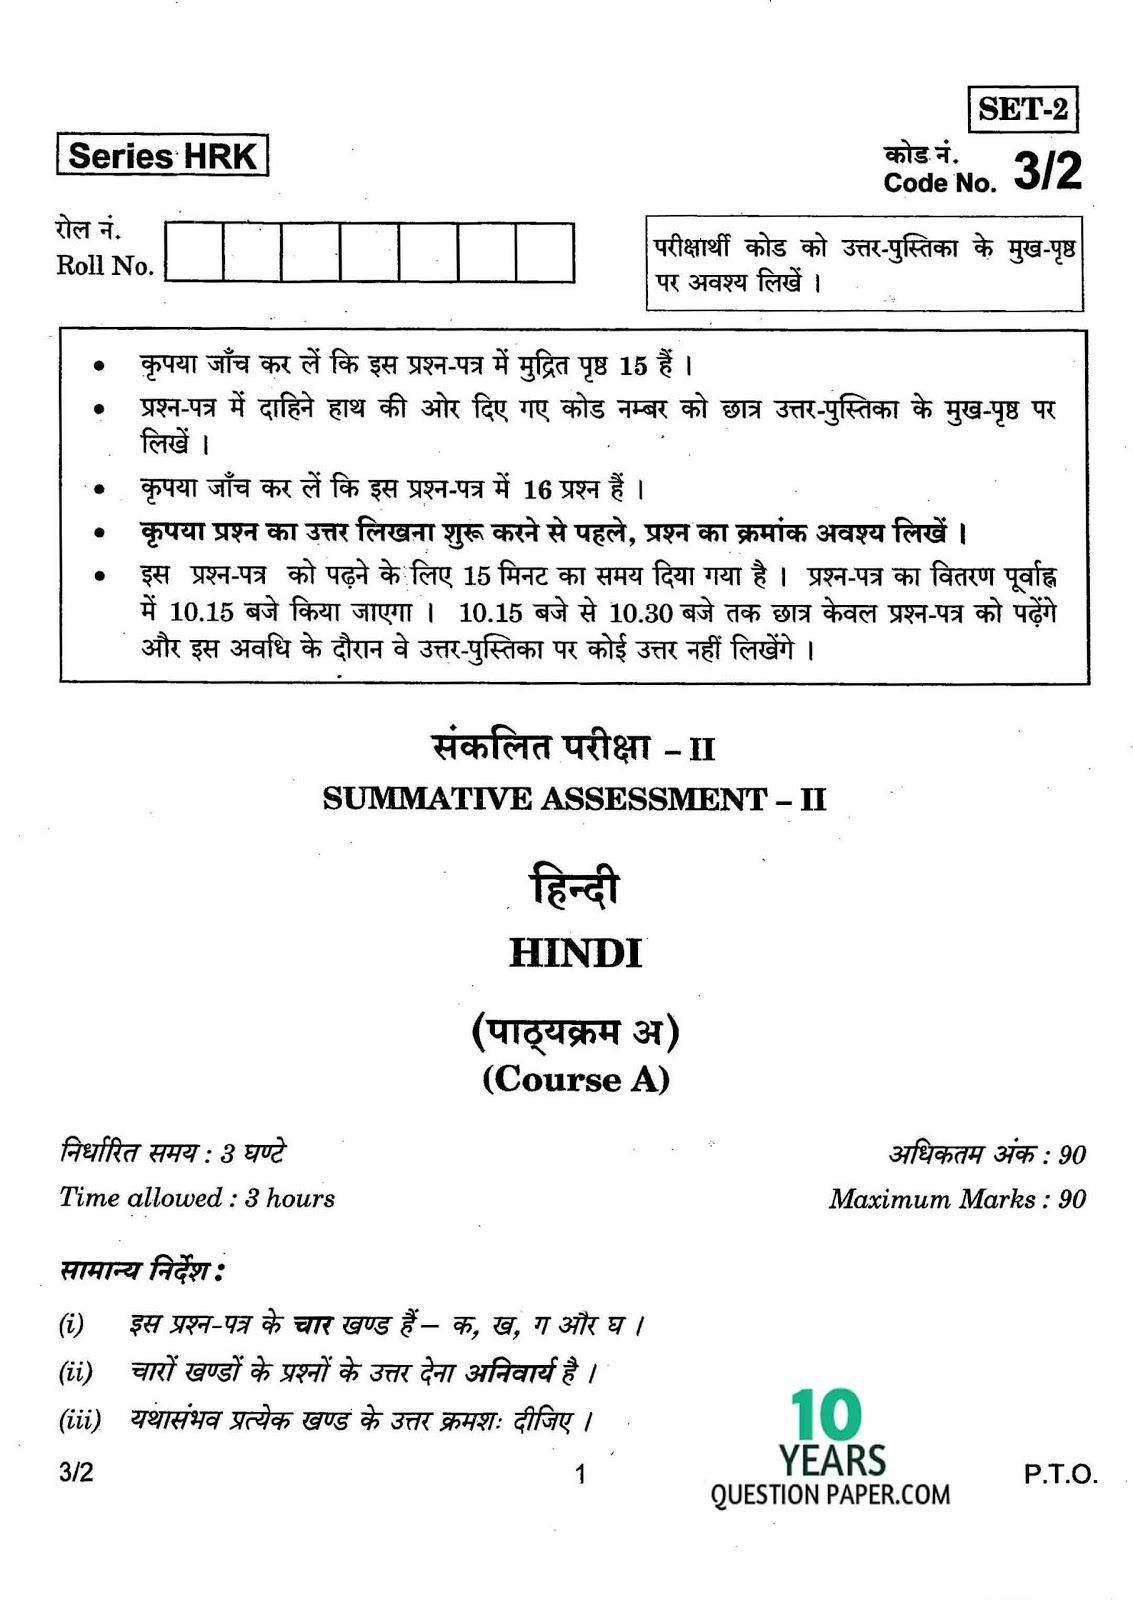 Cbse Class 10th Board Hindi Question Paper Set 2